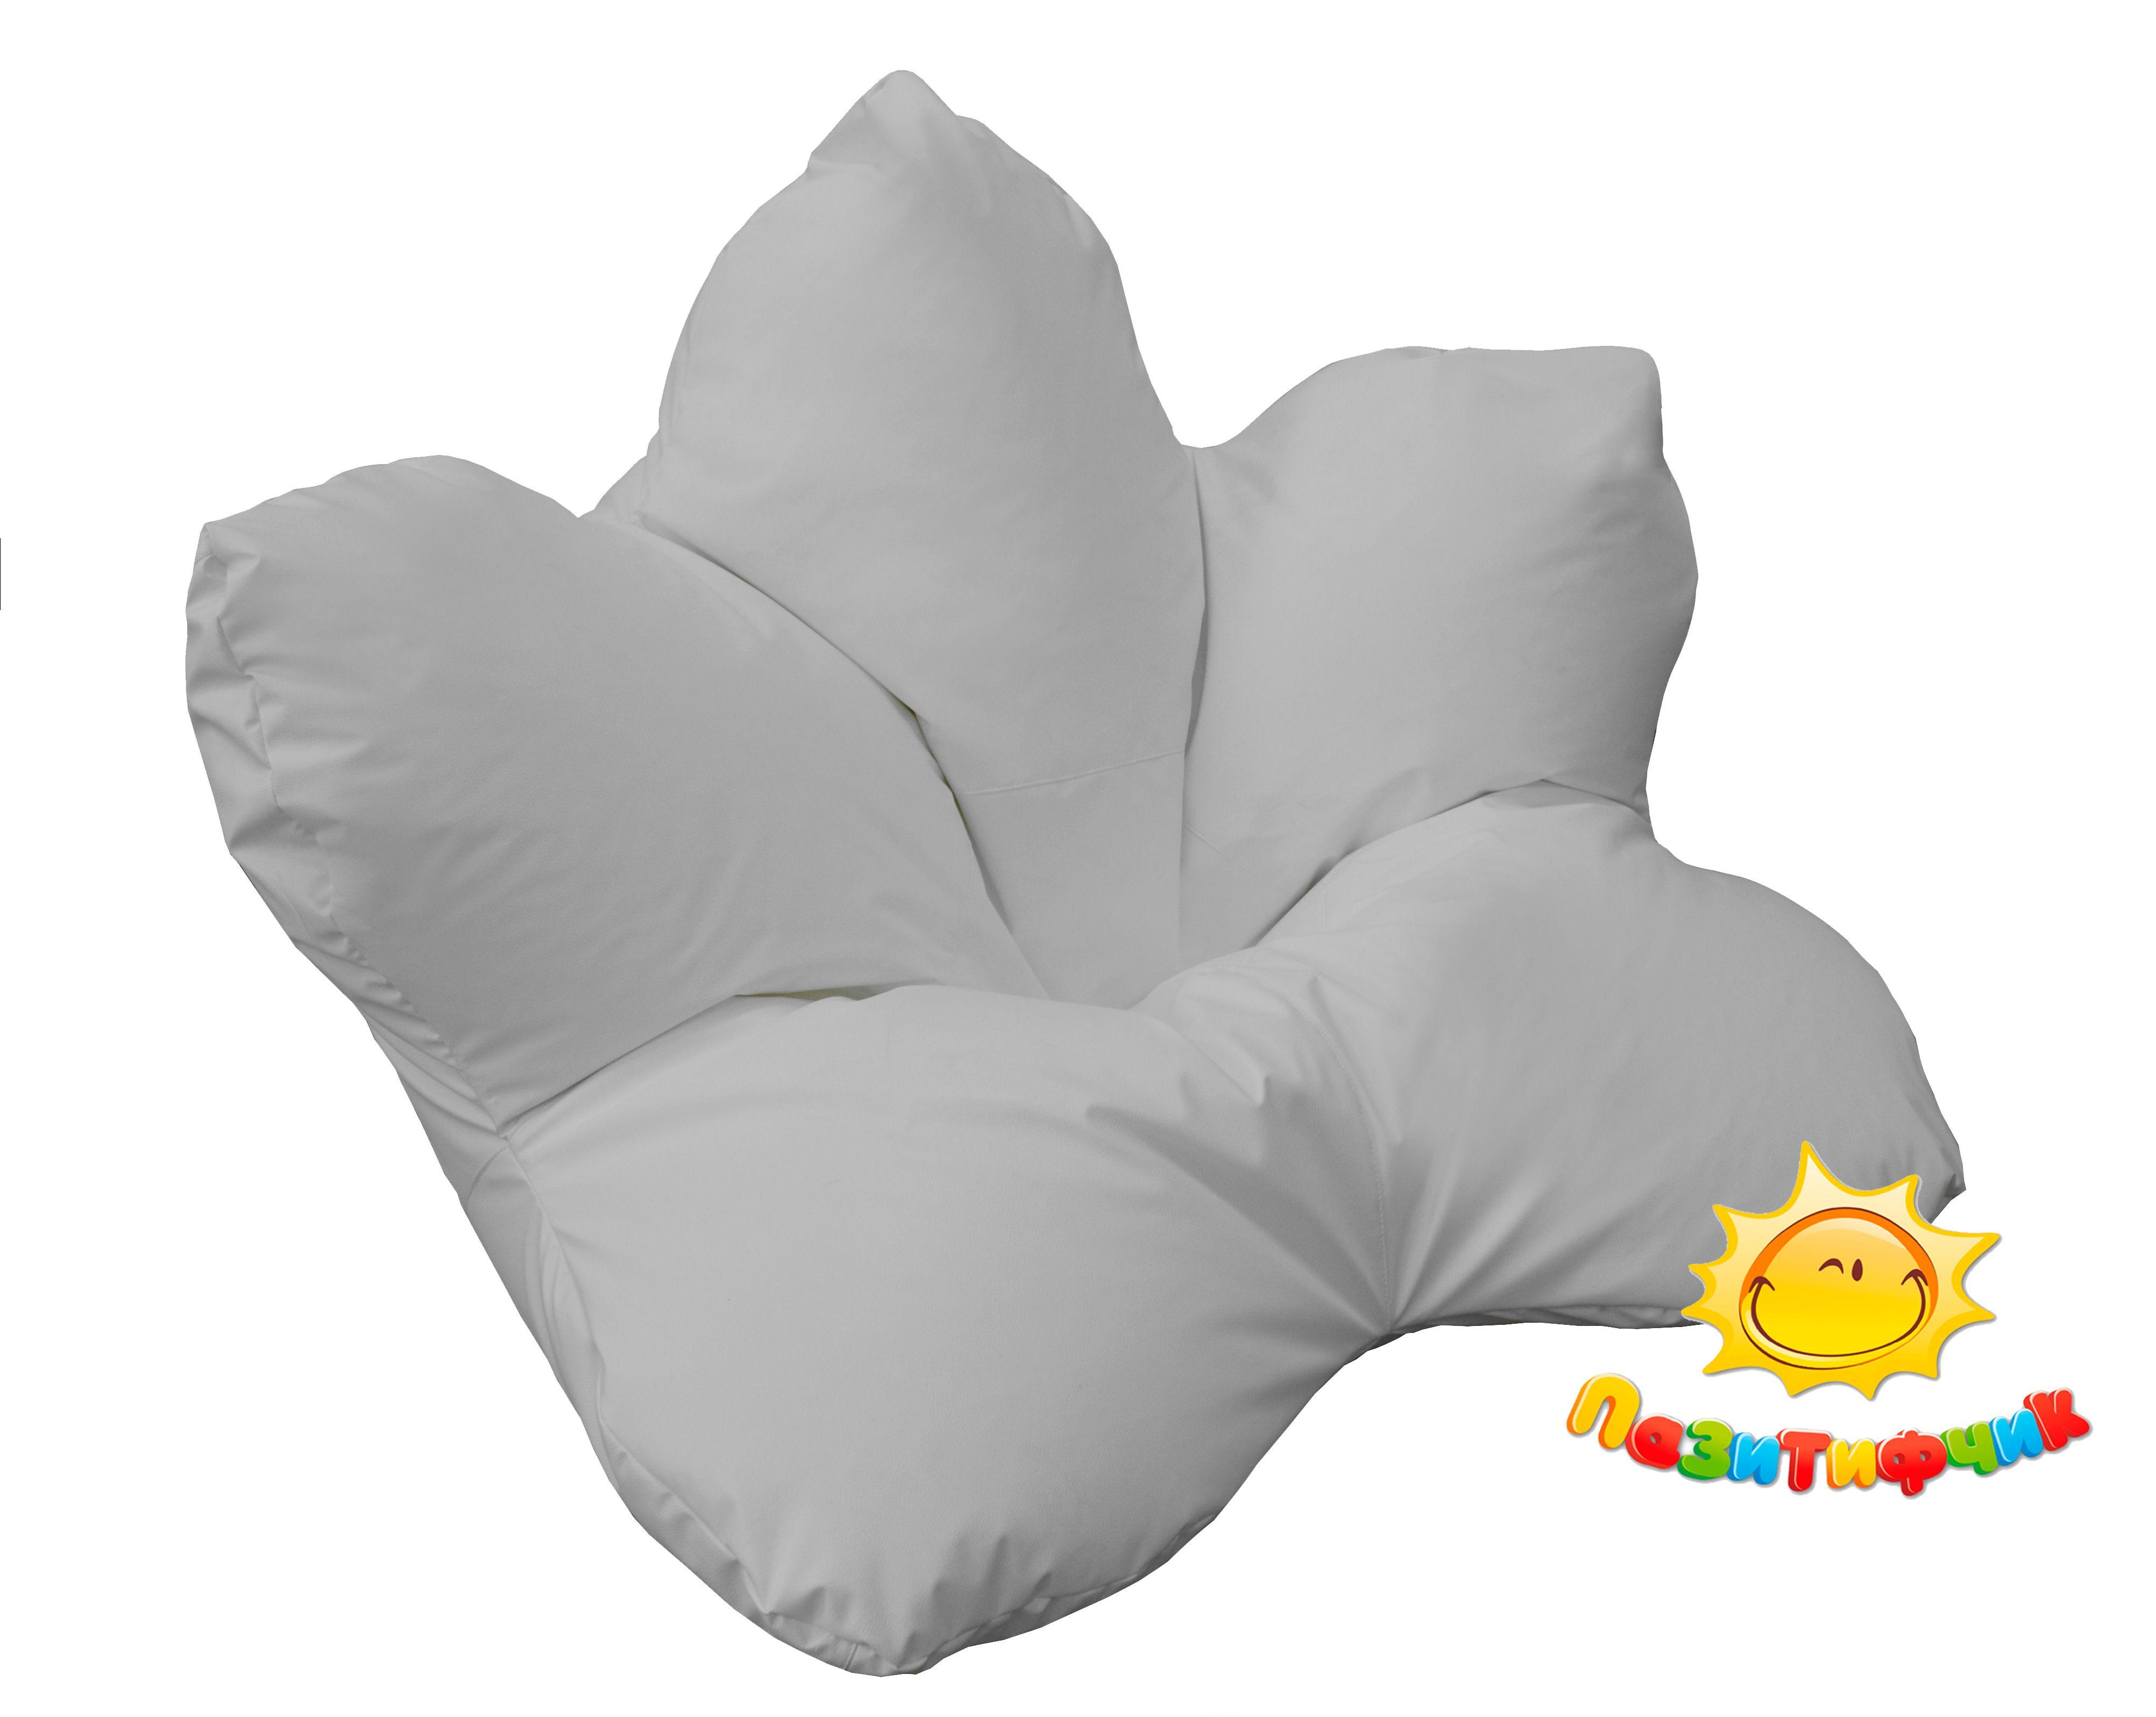 Кресло-мешок Pazitif Цветок Пазитифчик, размер XXXL, экокожа, белый